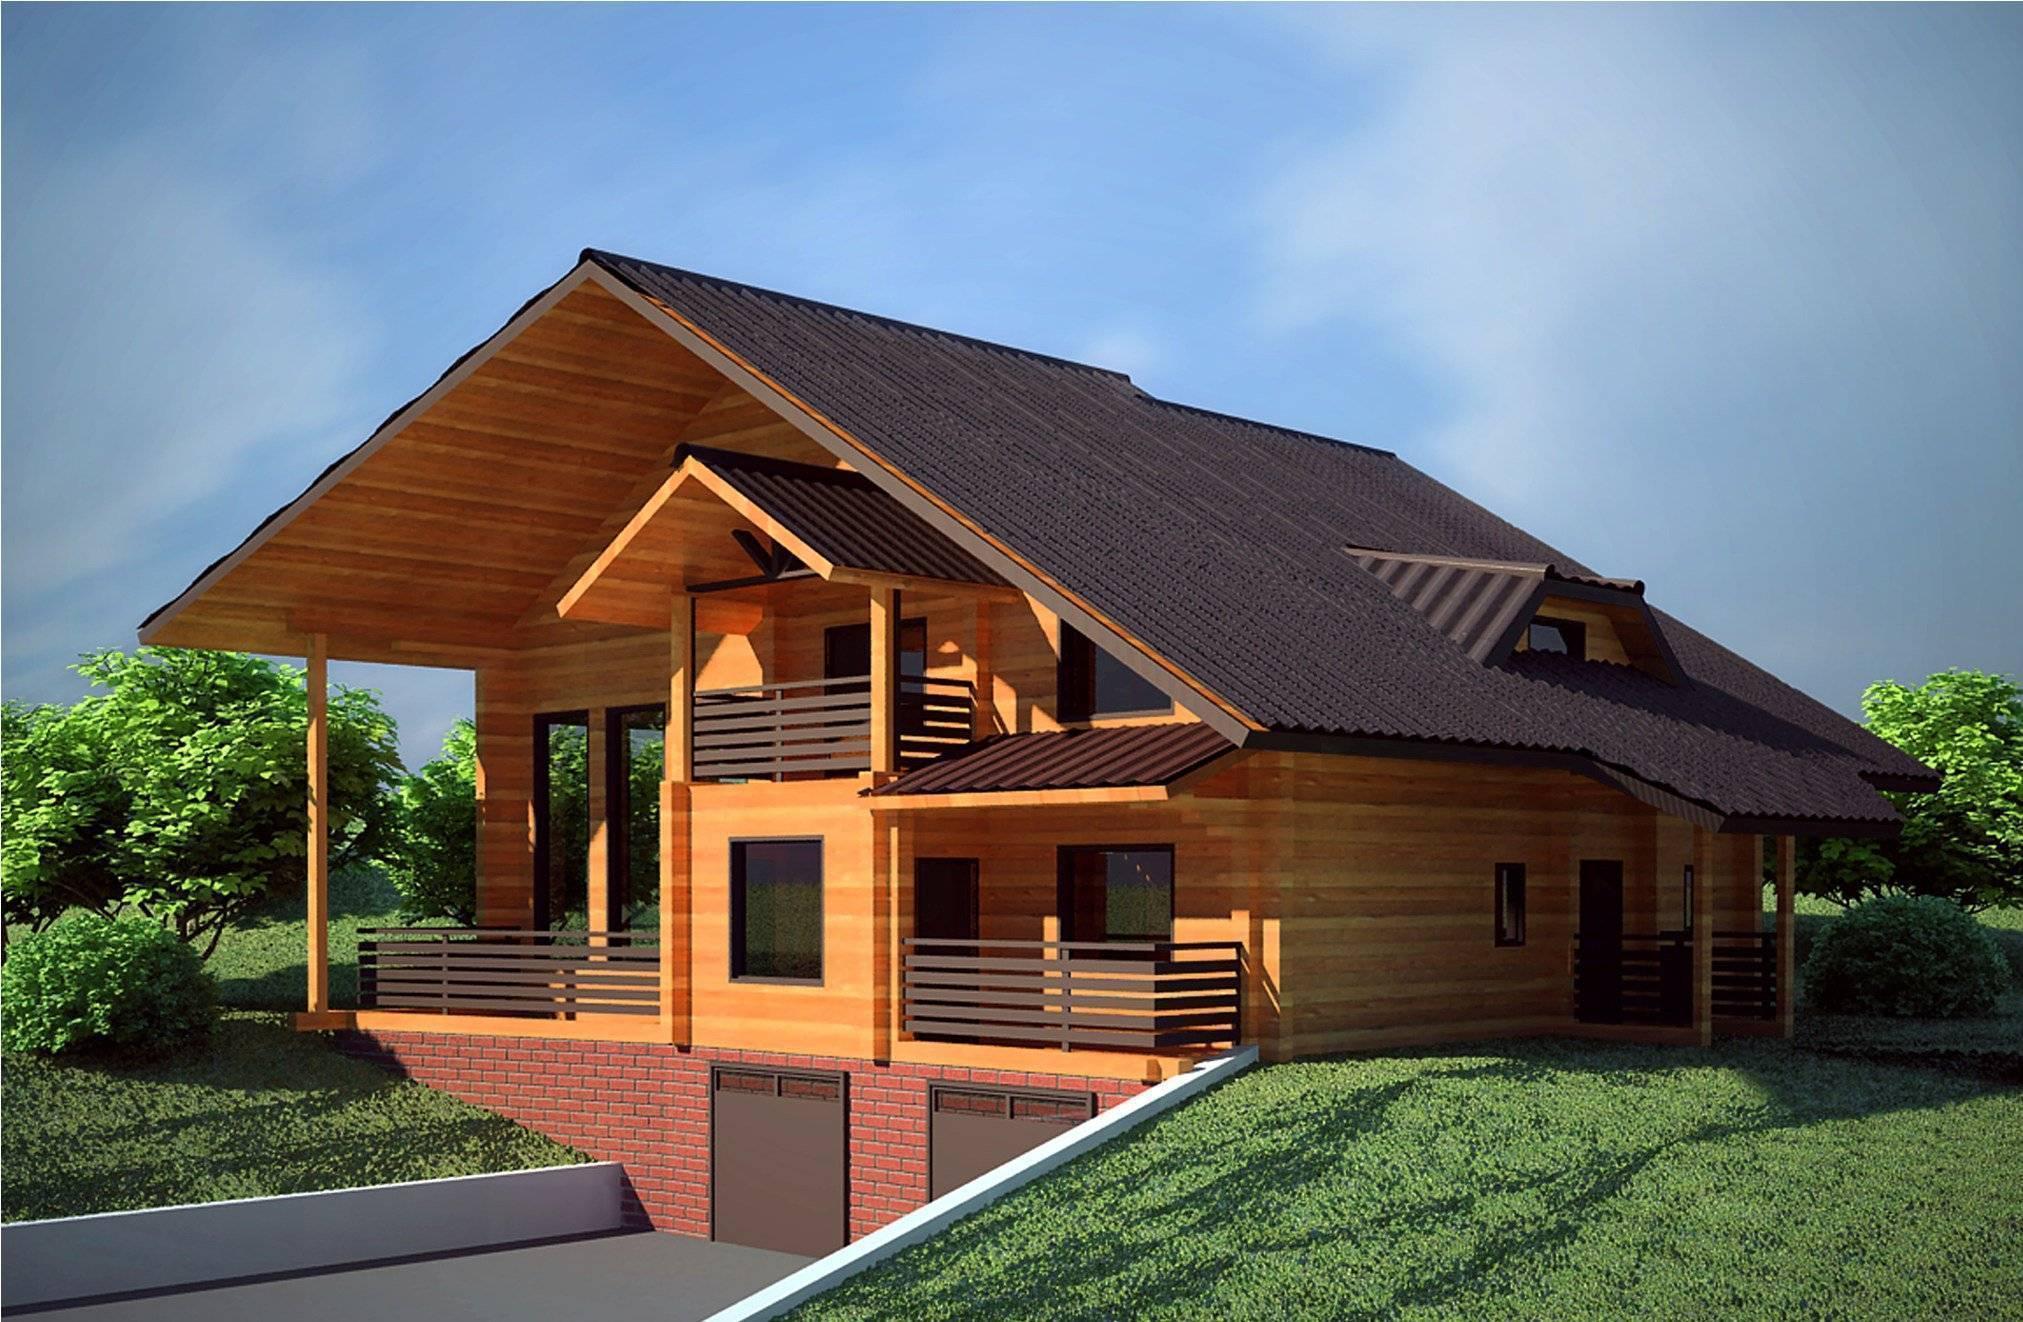 Дома из бруса в стиле Шале: архитектура и материалы